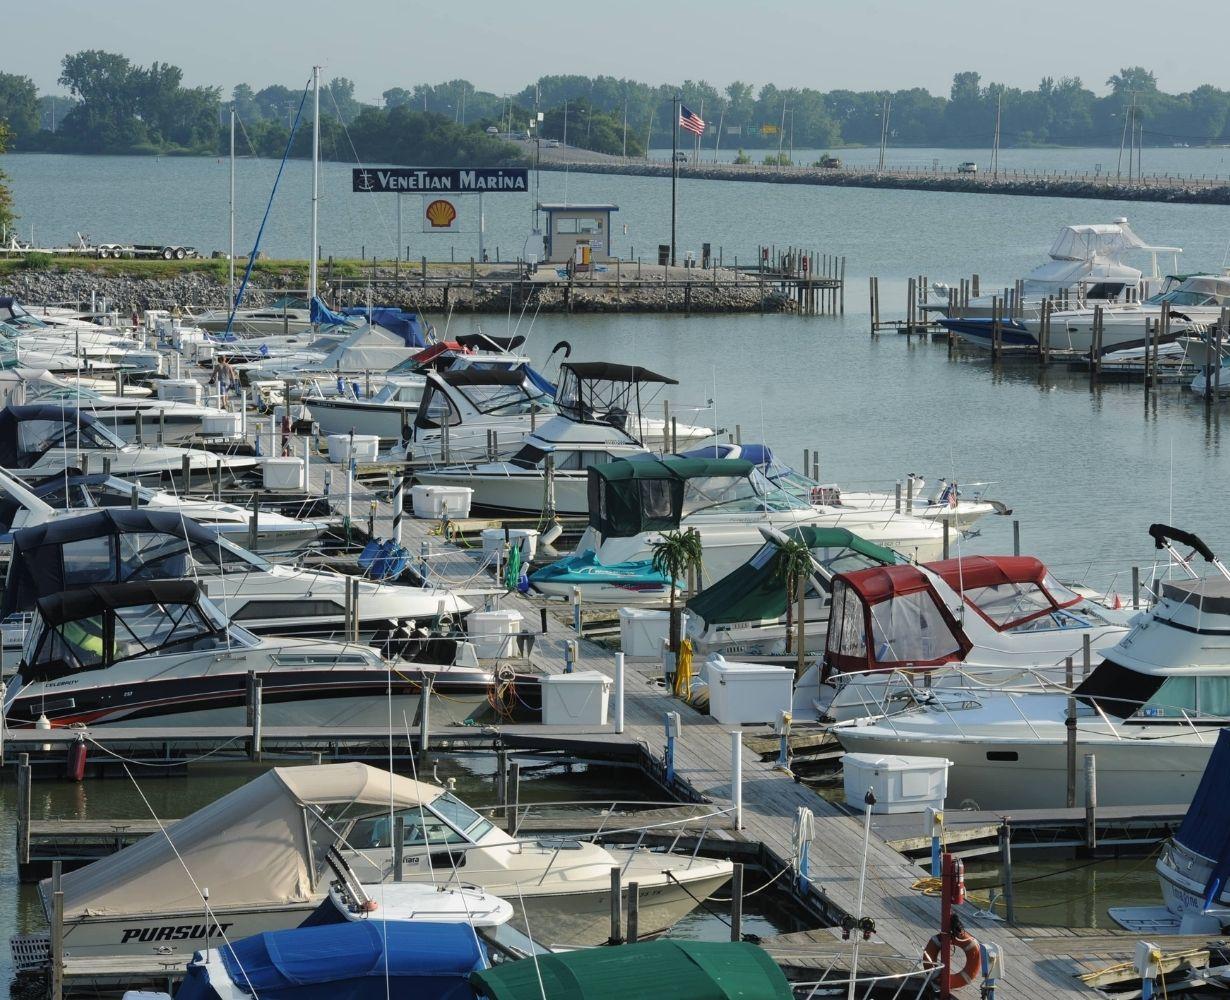 venetian-marina-sandusky-ohio-gallery-docks-11